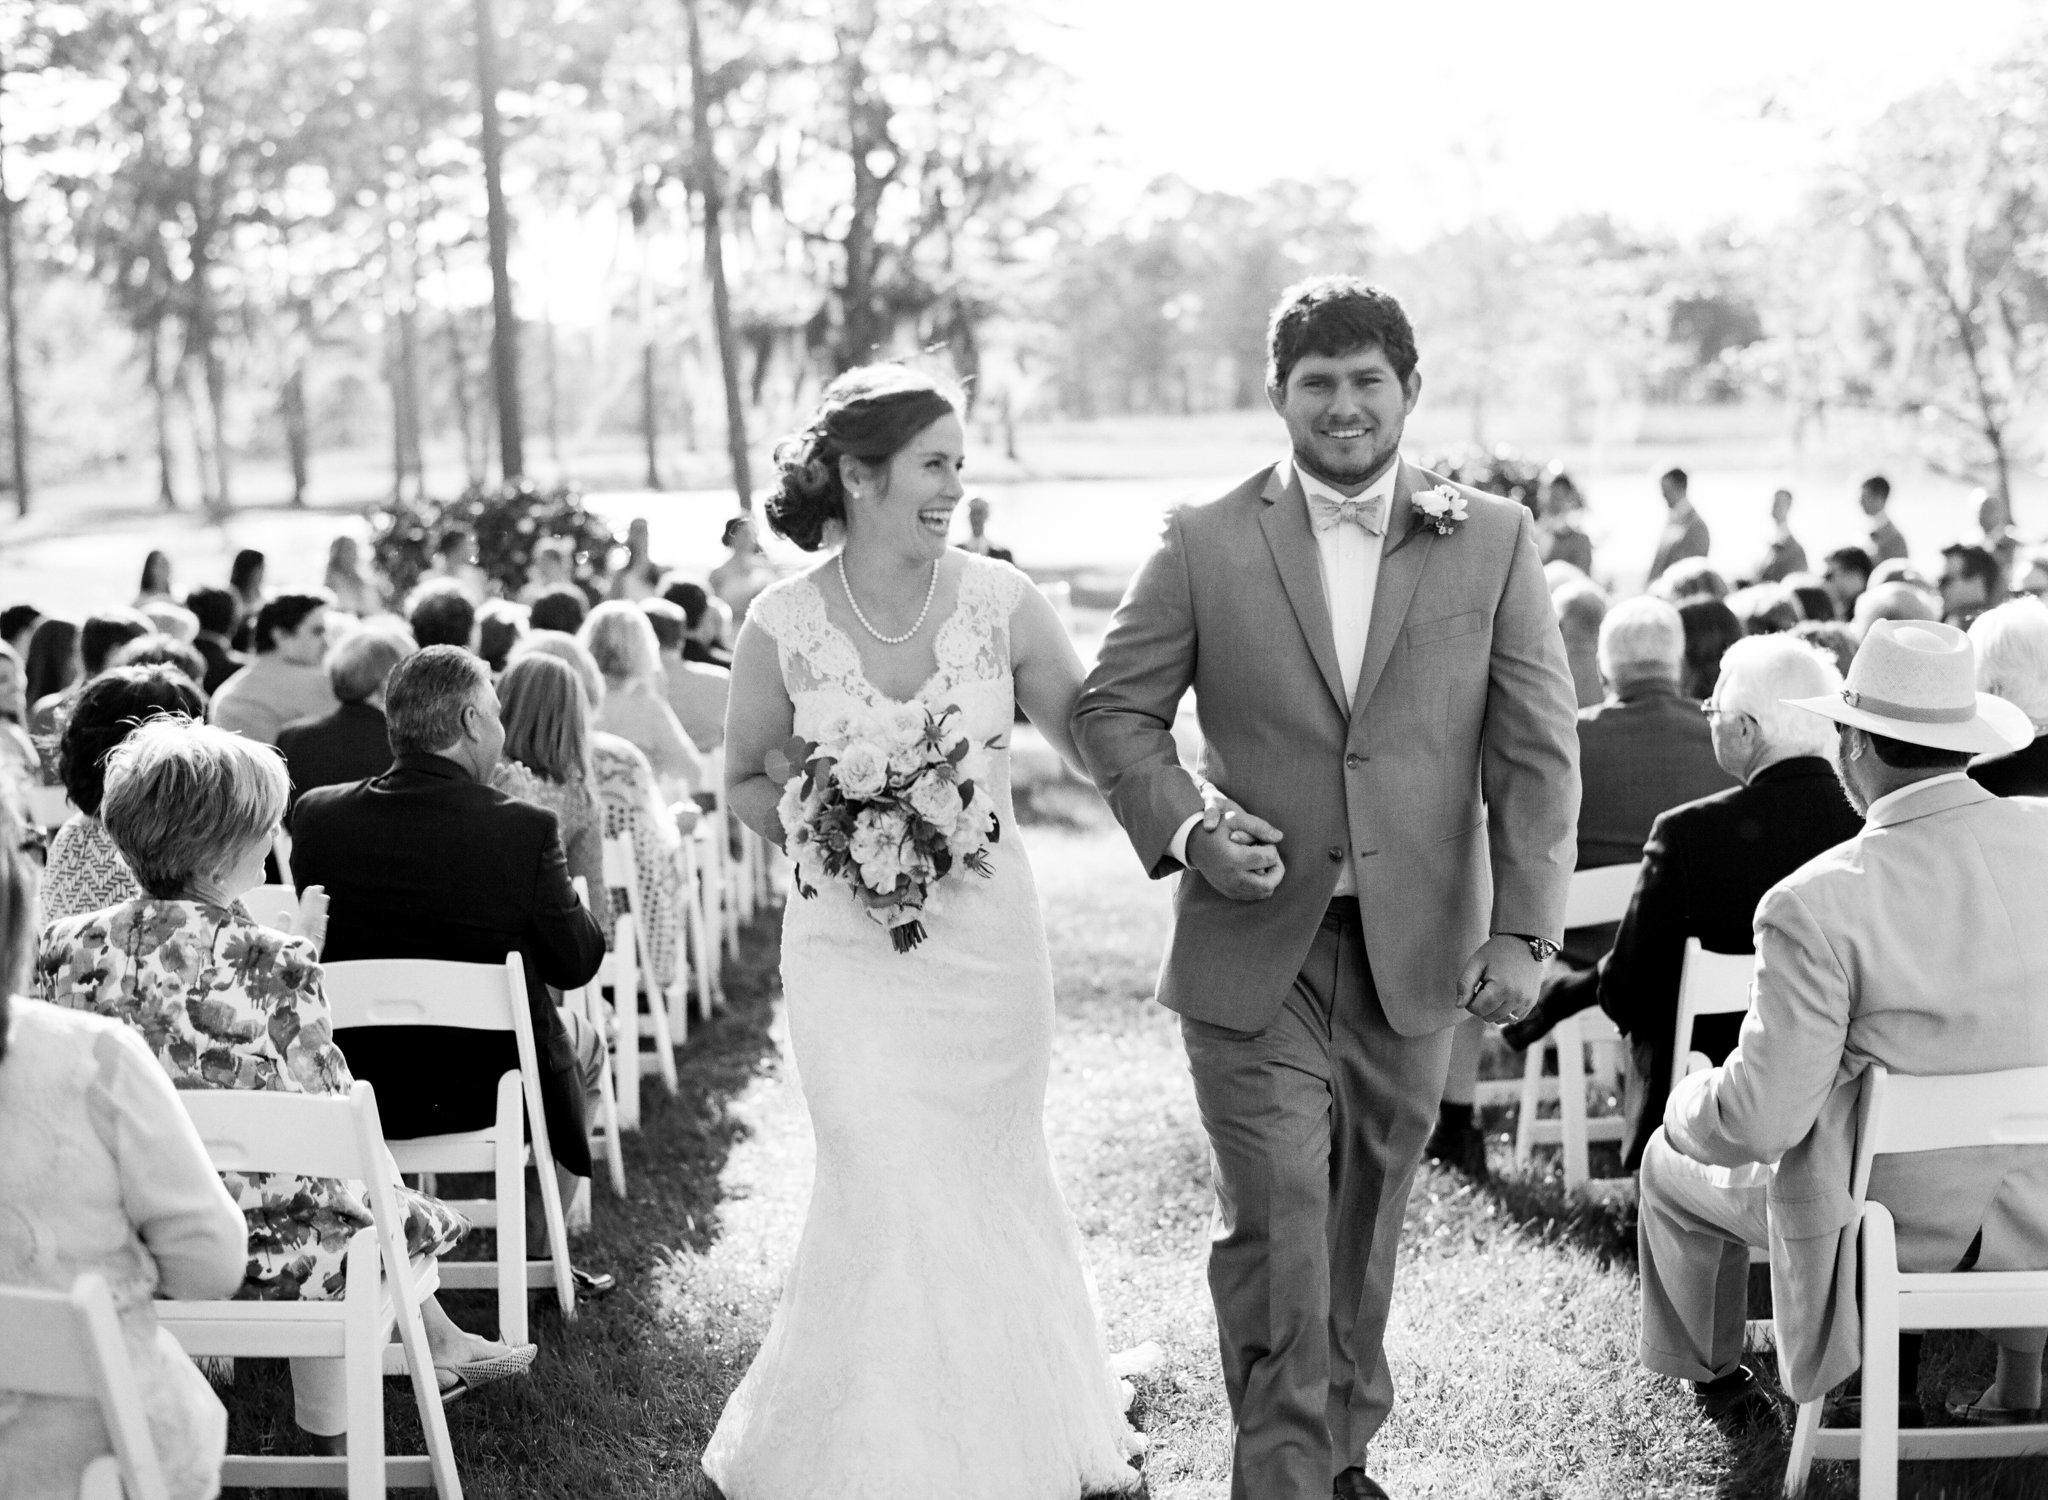 ecila farm wedding albany georgia wedding photographer shannon griffin photography-76.jpg